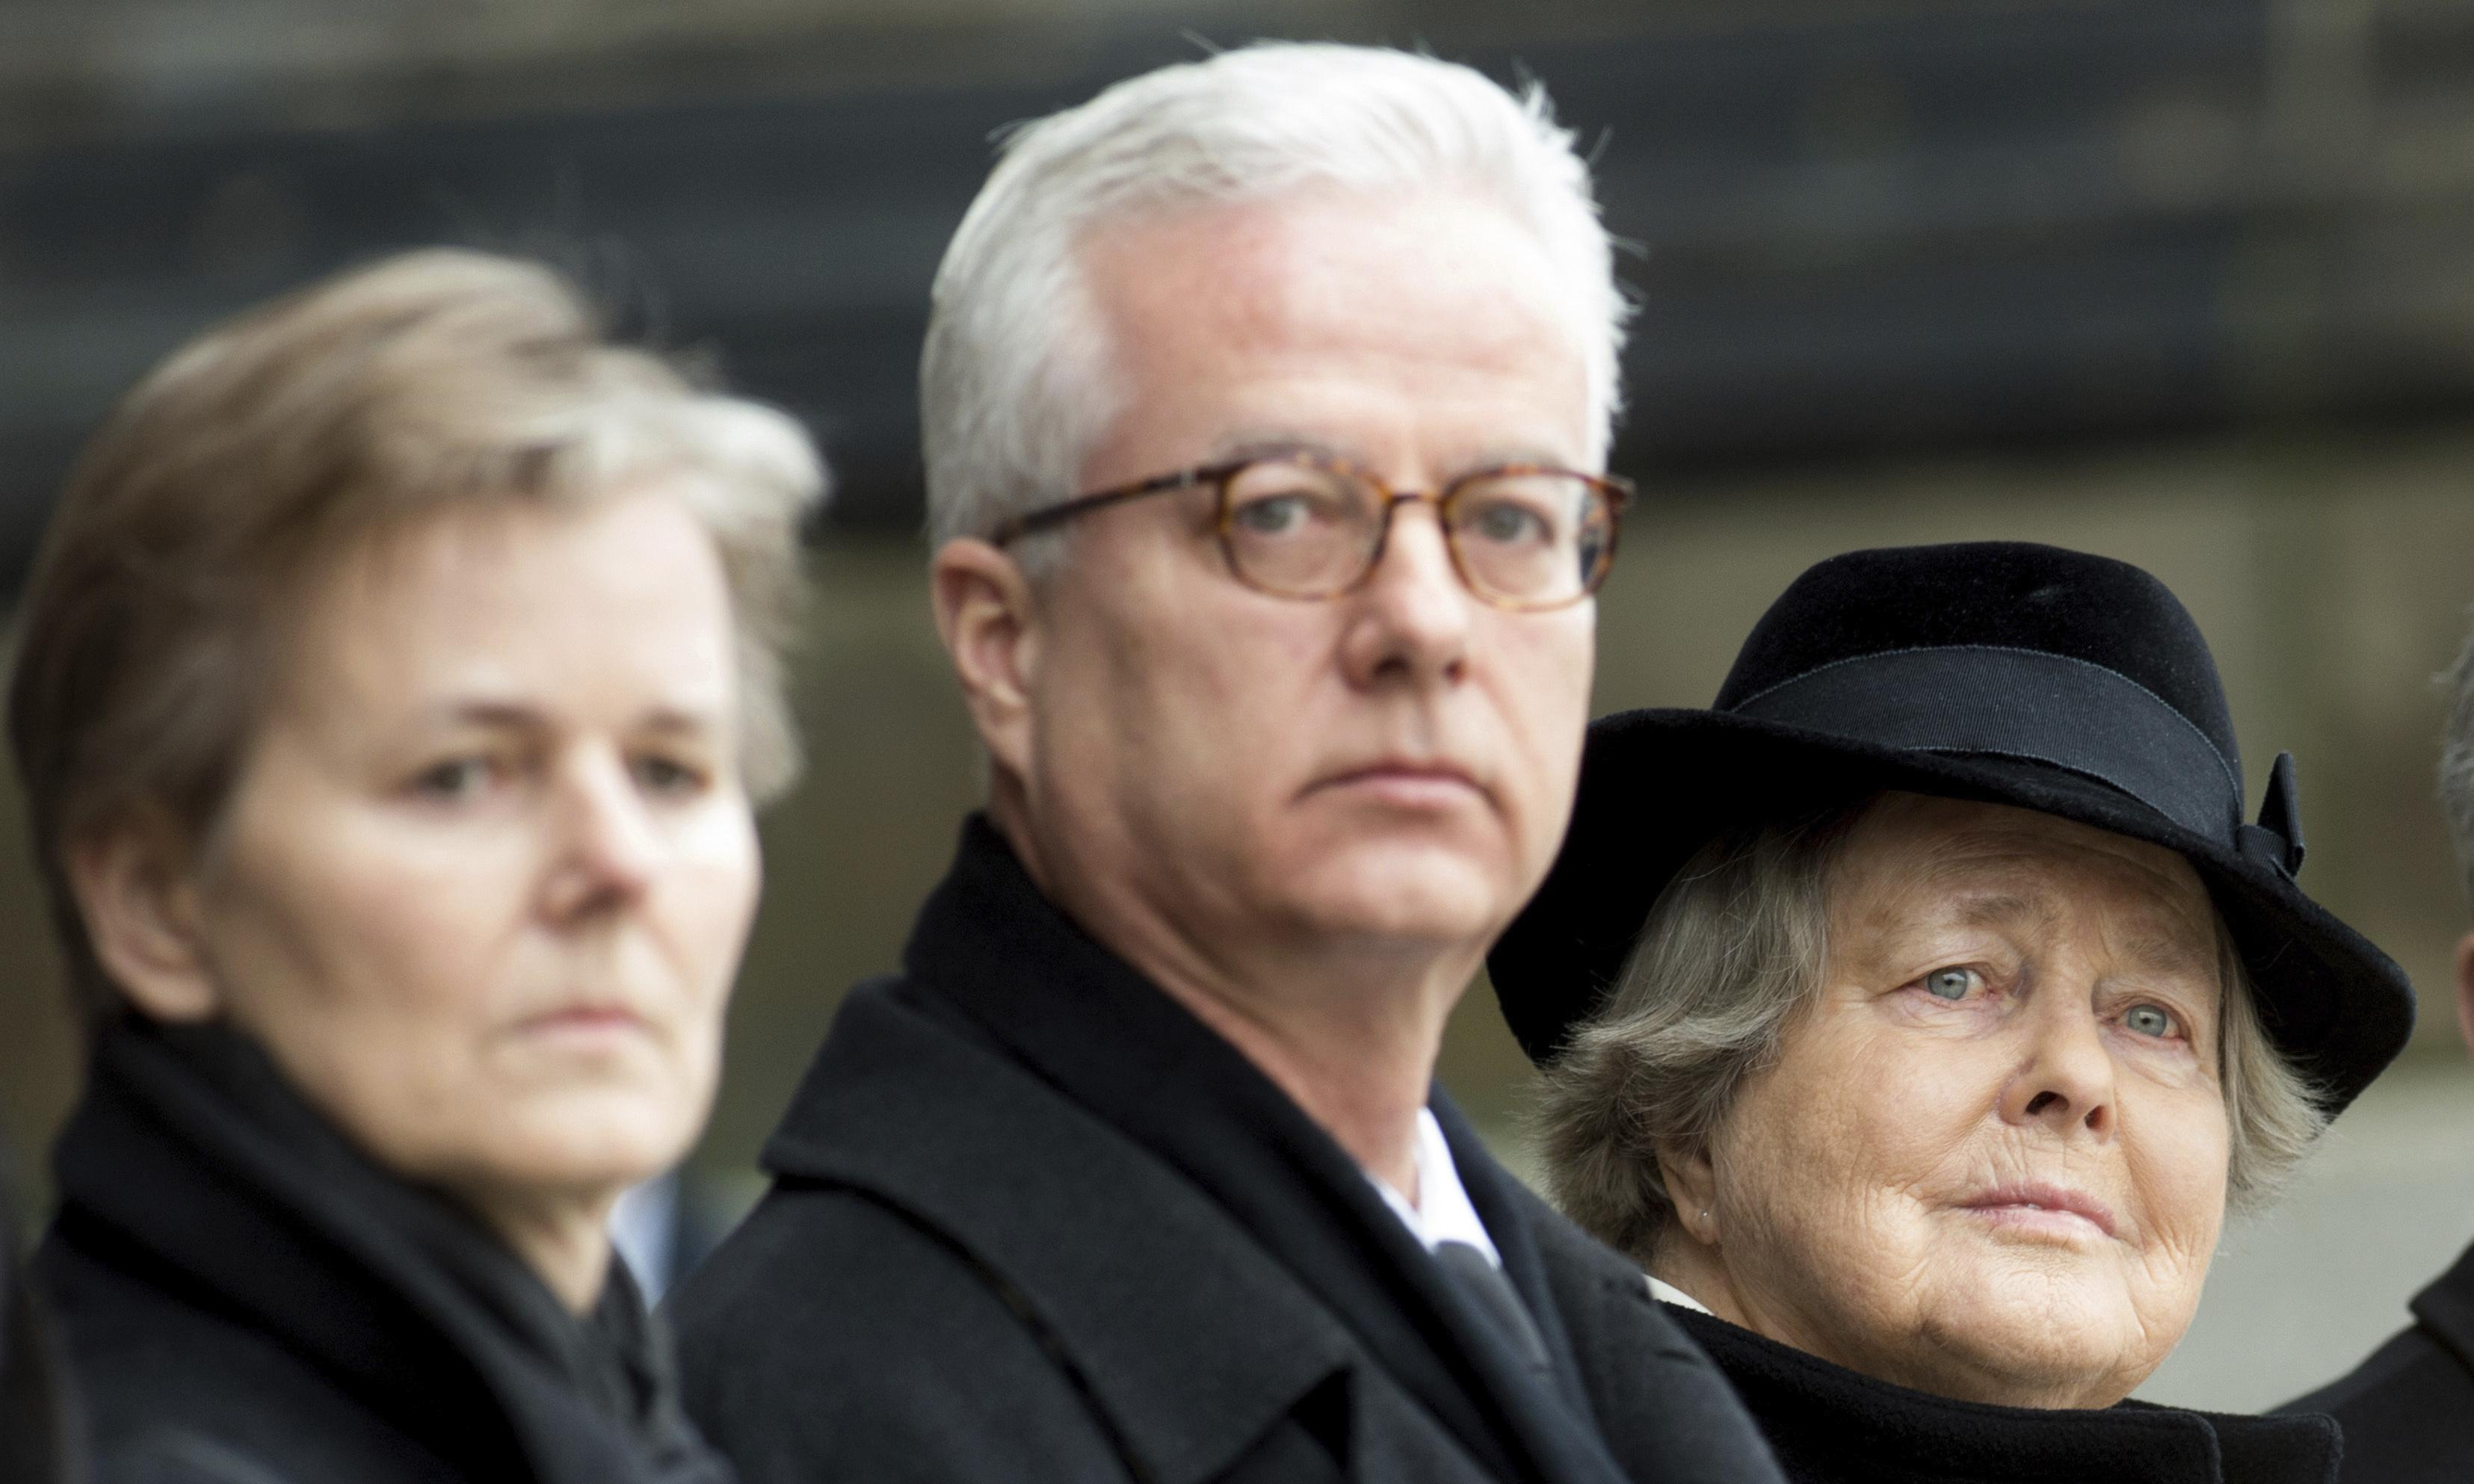 Son of former German president fatally stabbed in Berlin